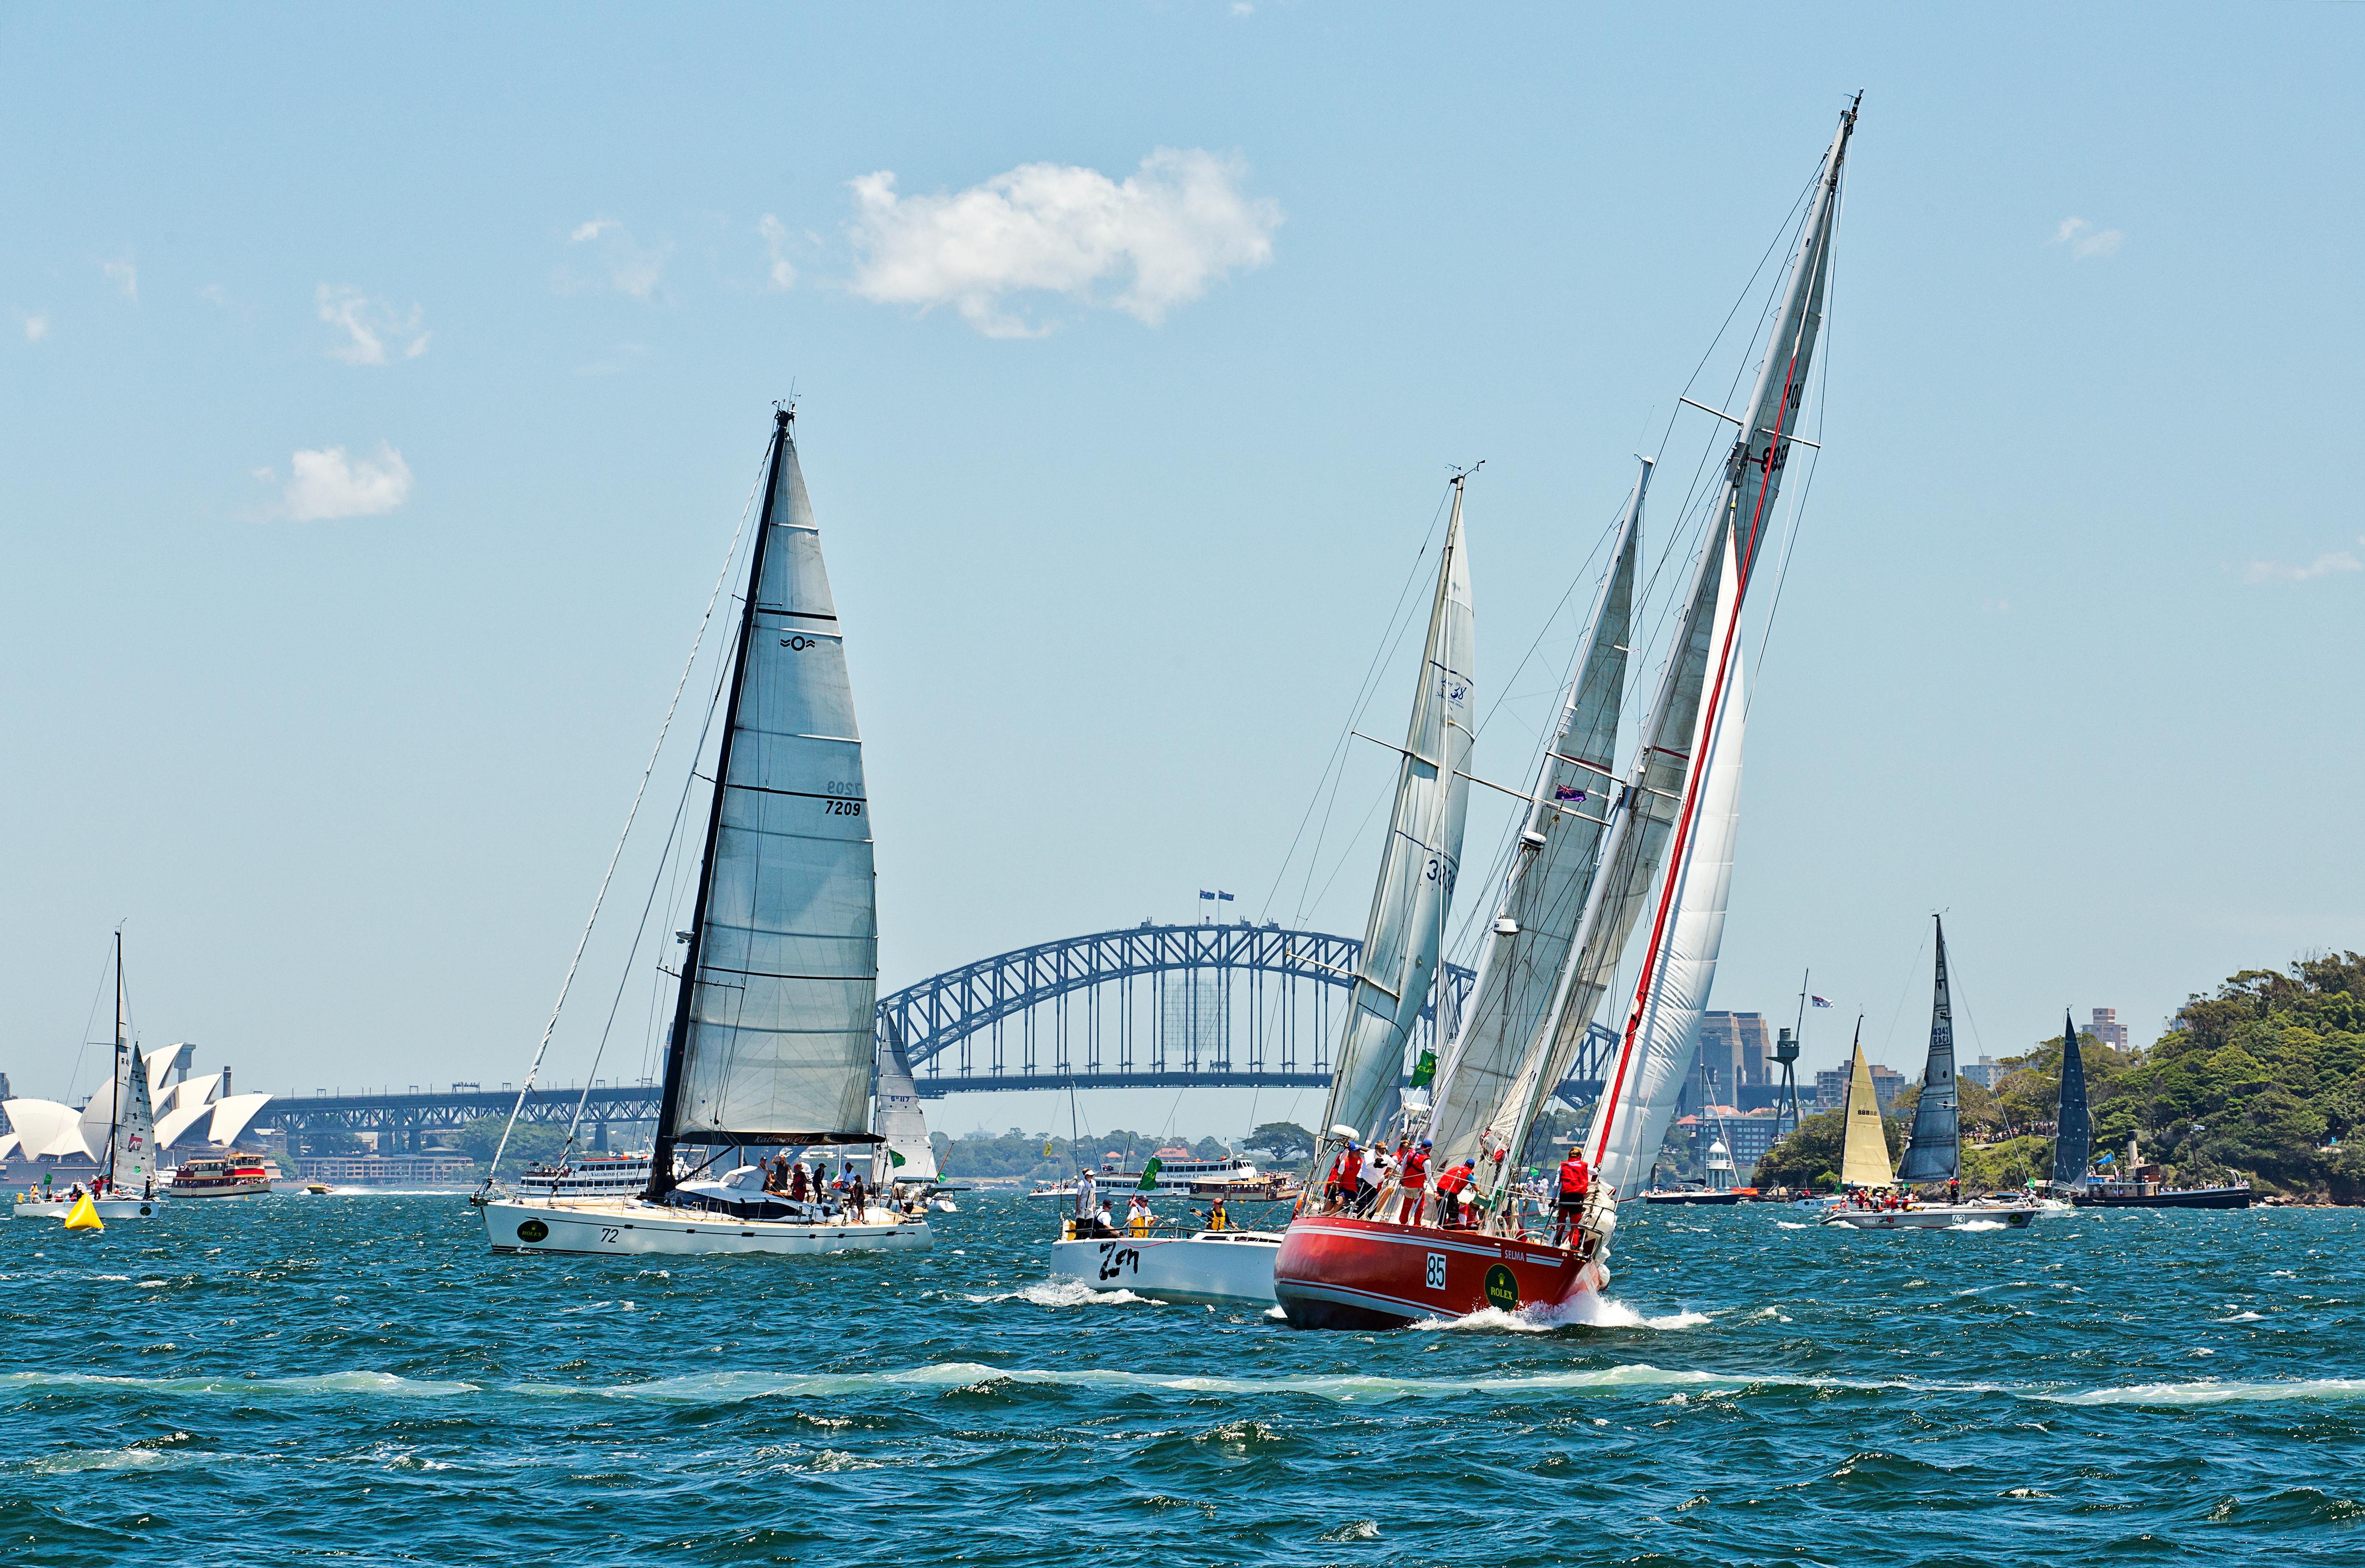 PIC renews sponsorship of Coastal Classic yacht race